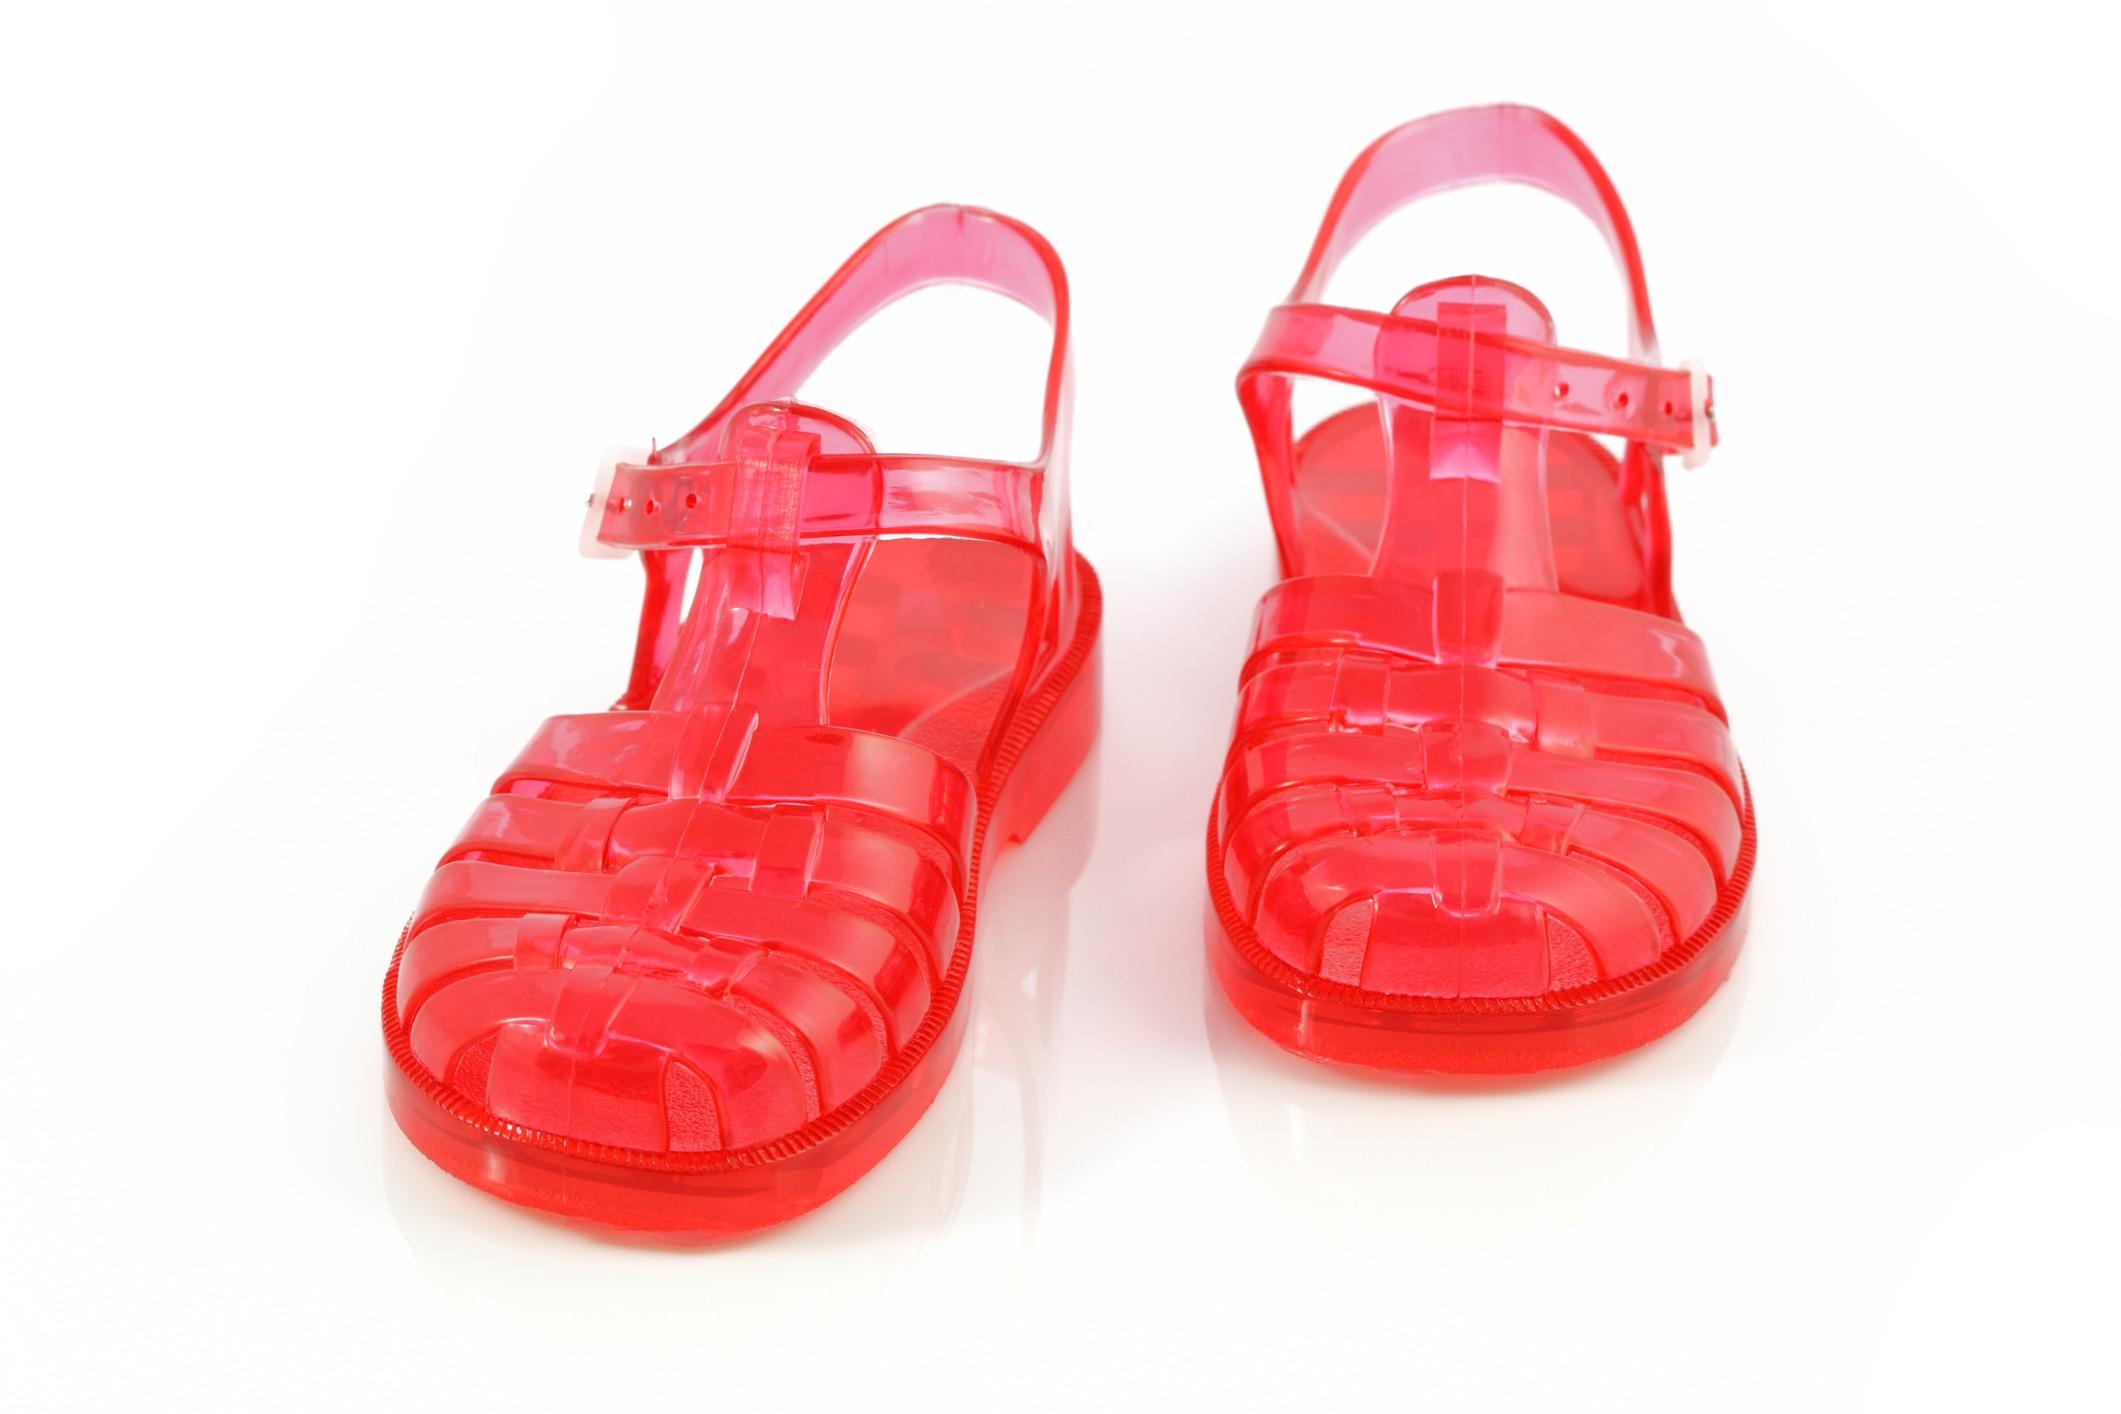 Jellies sandals